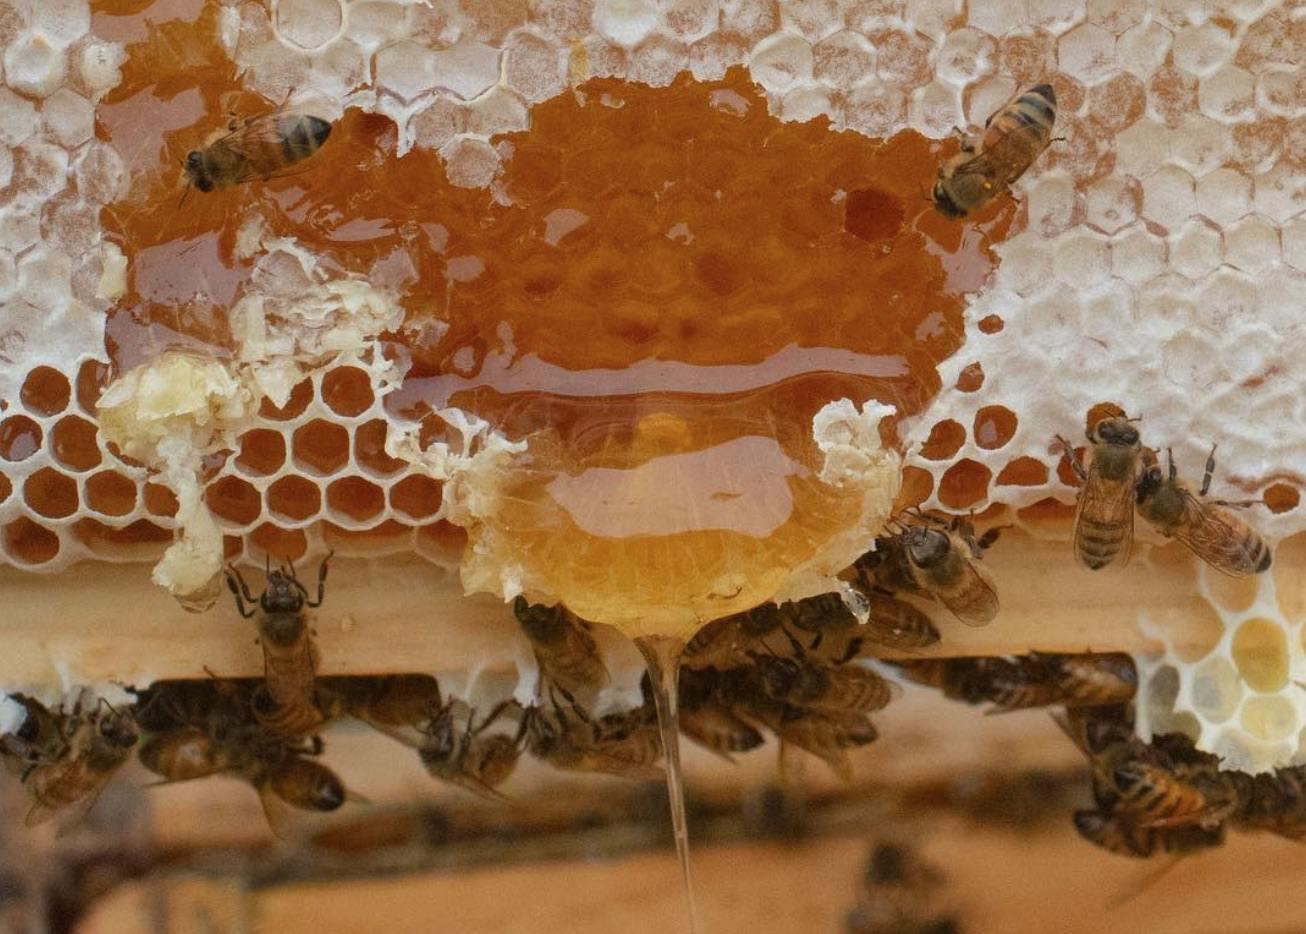 Bees working at Vandehoney.